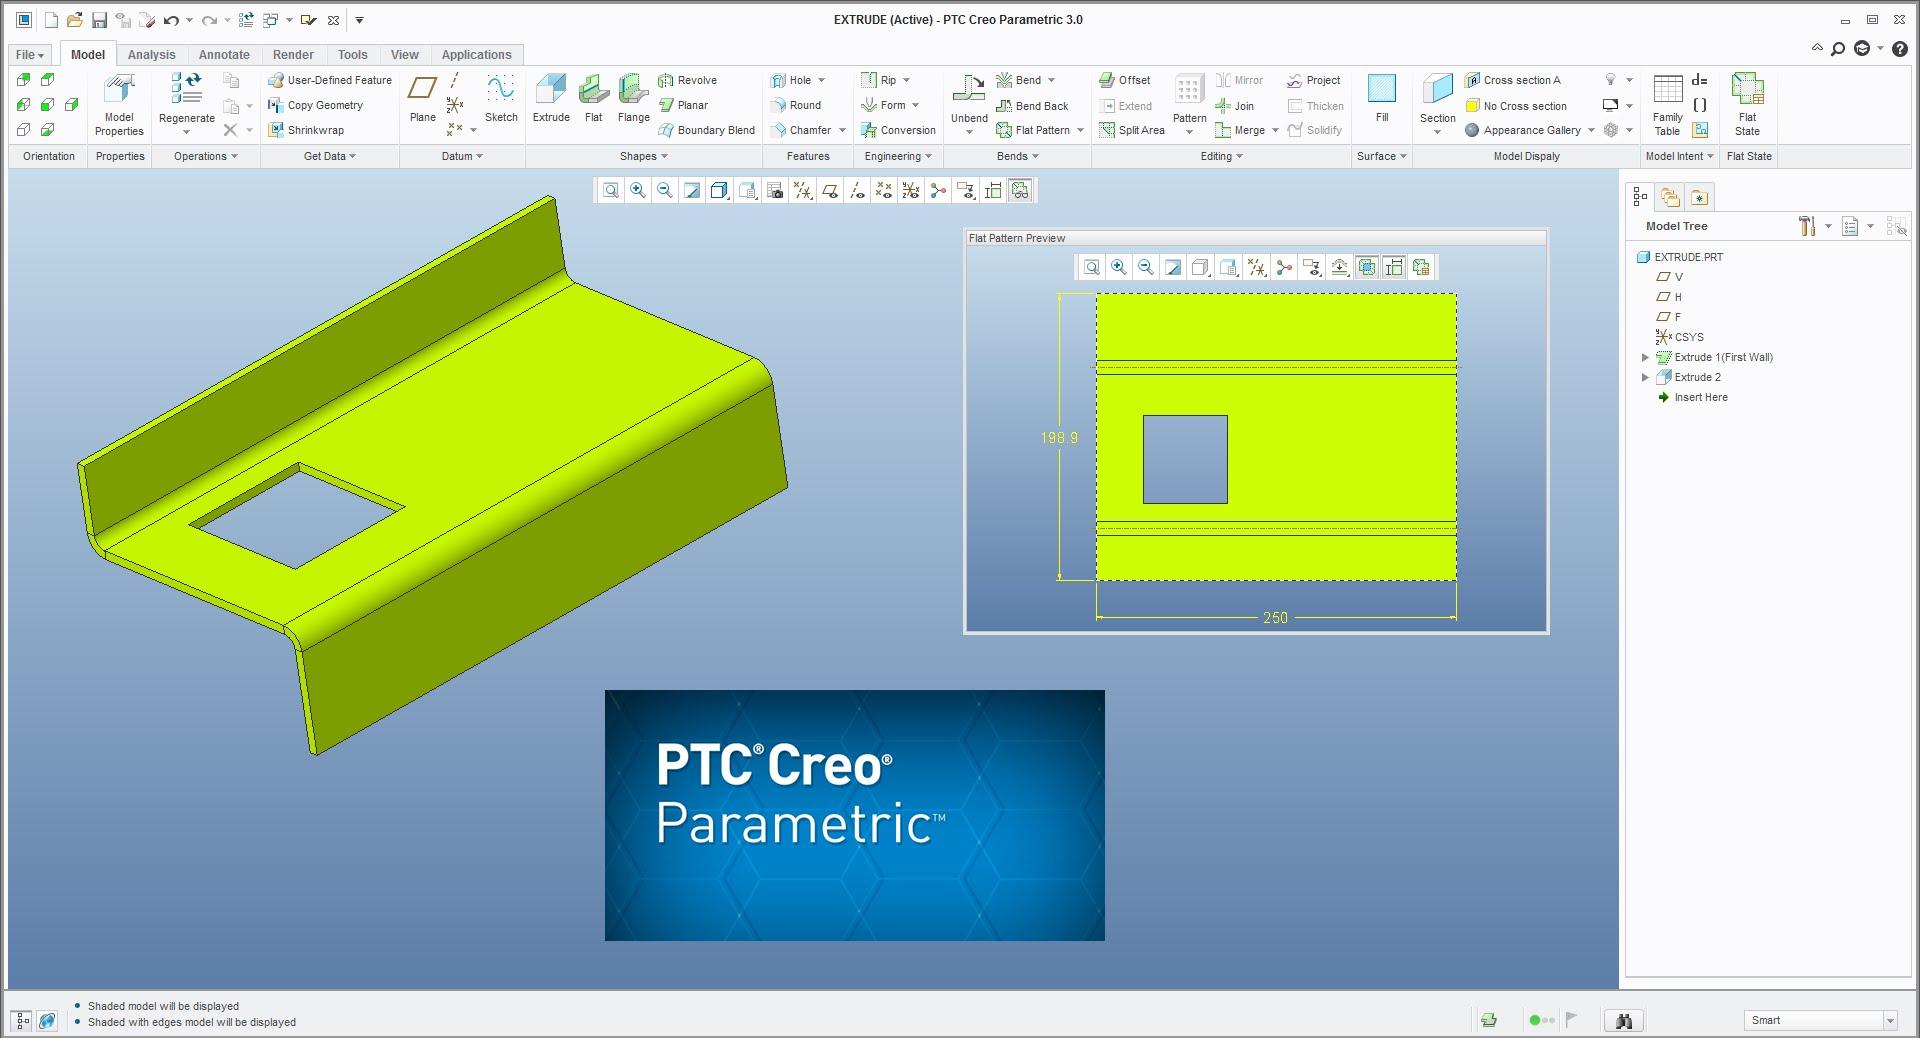 Working with PTC Creo parametric 3.0 M110 - 32bit - 64bit full crack